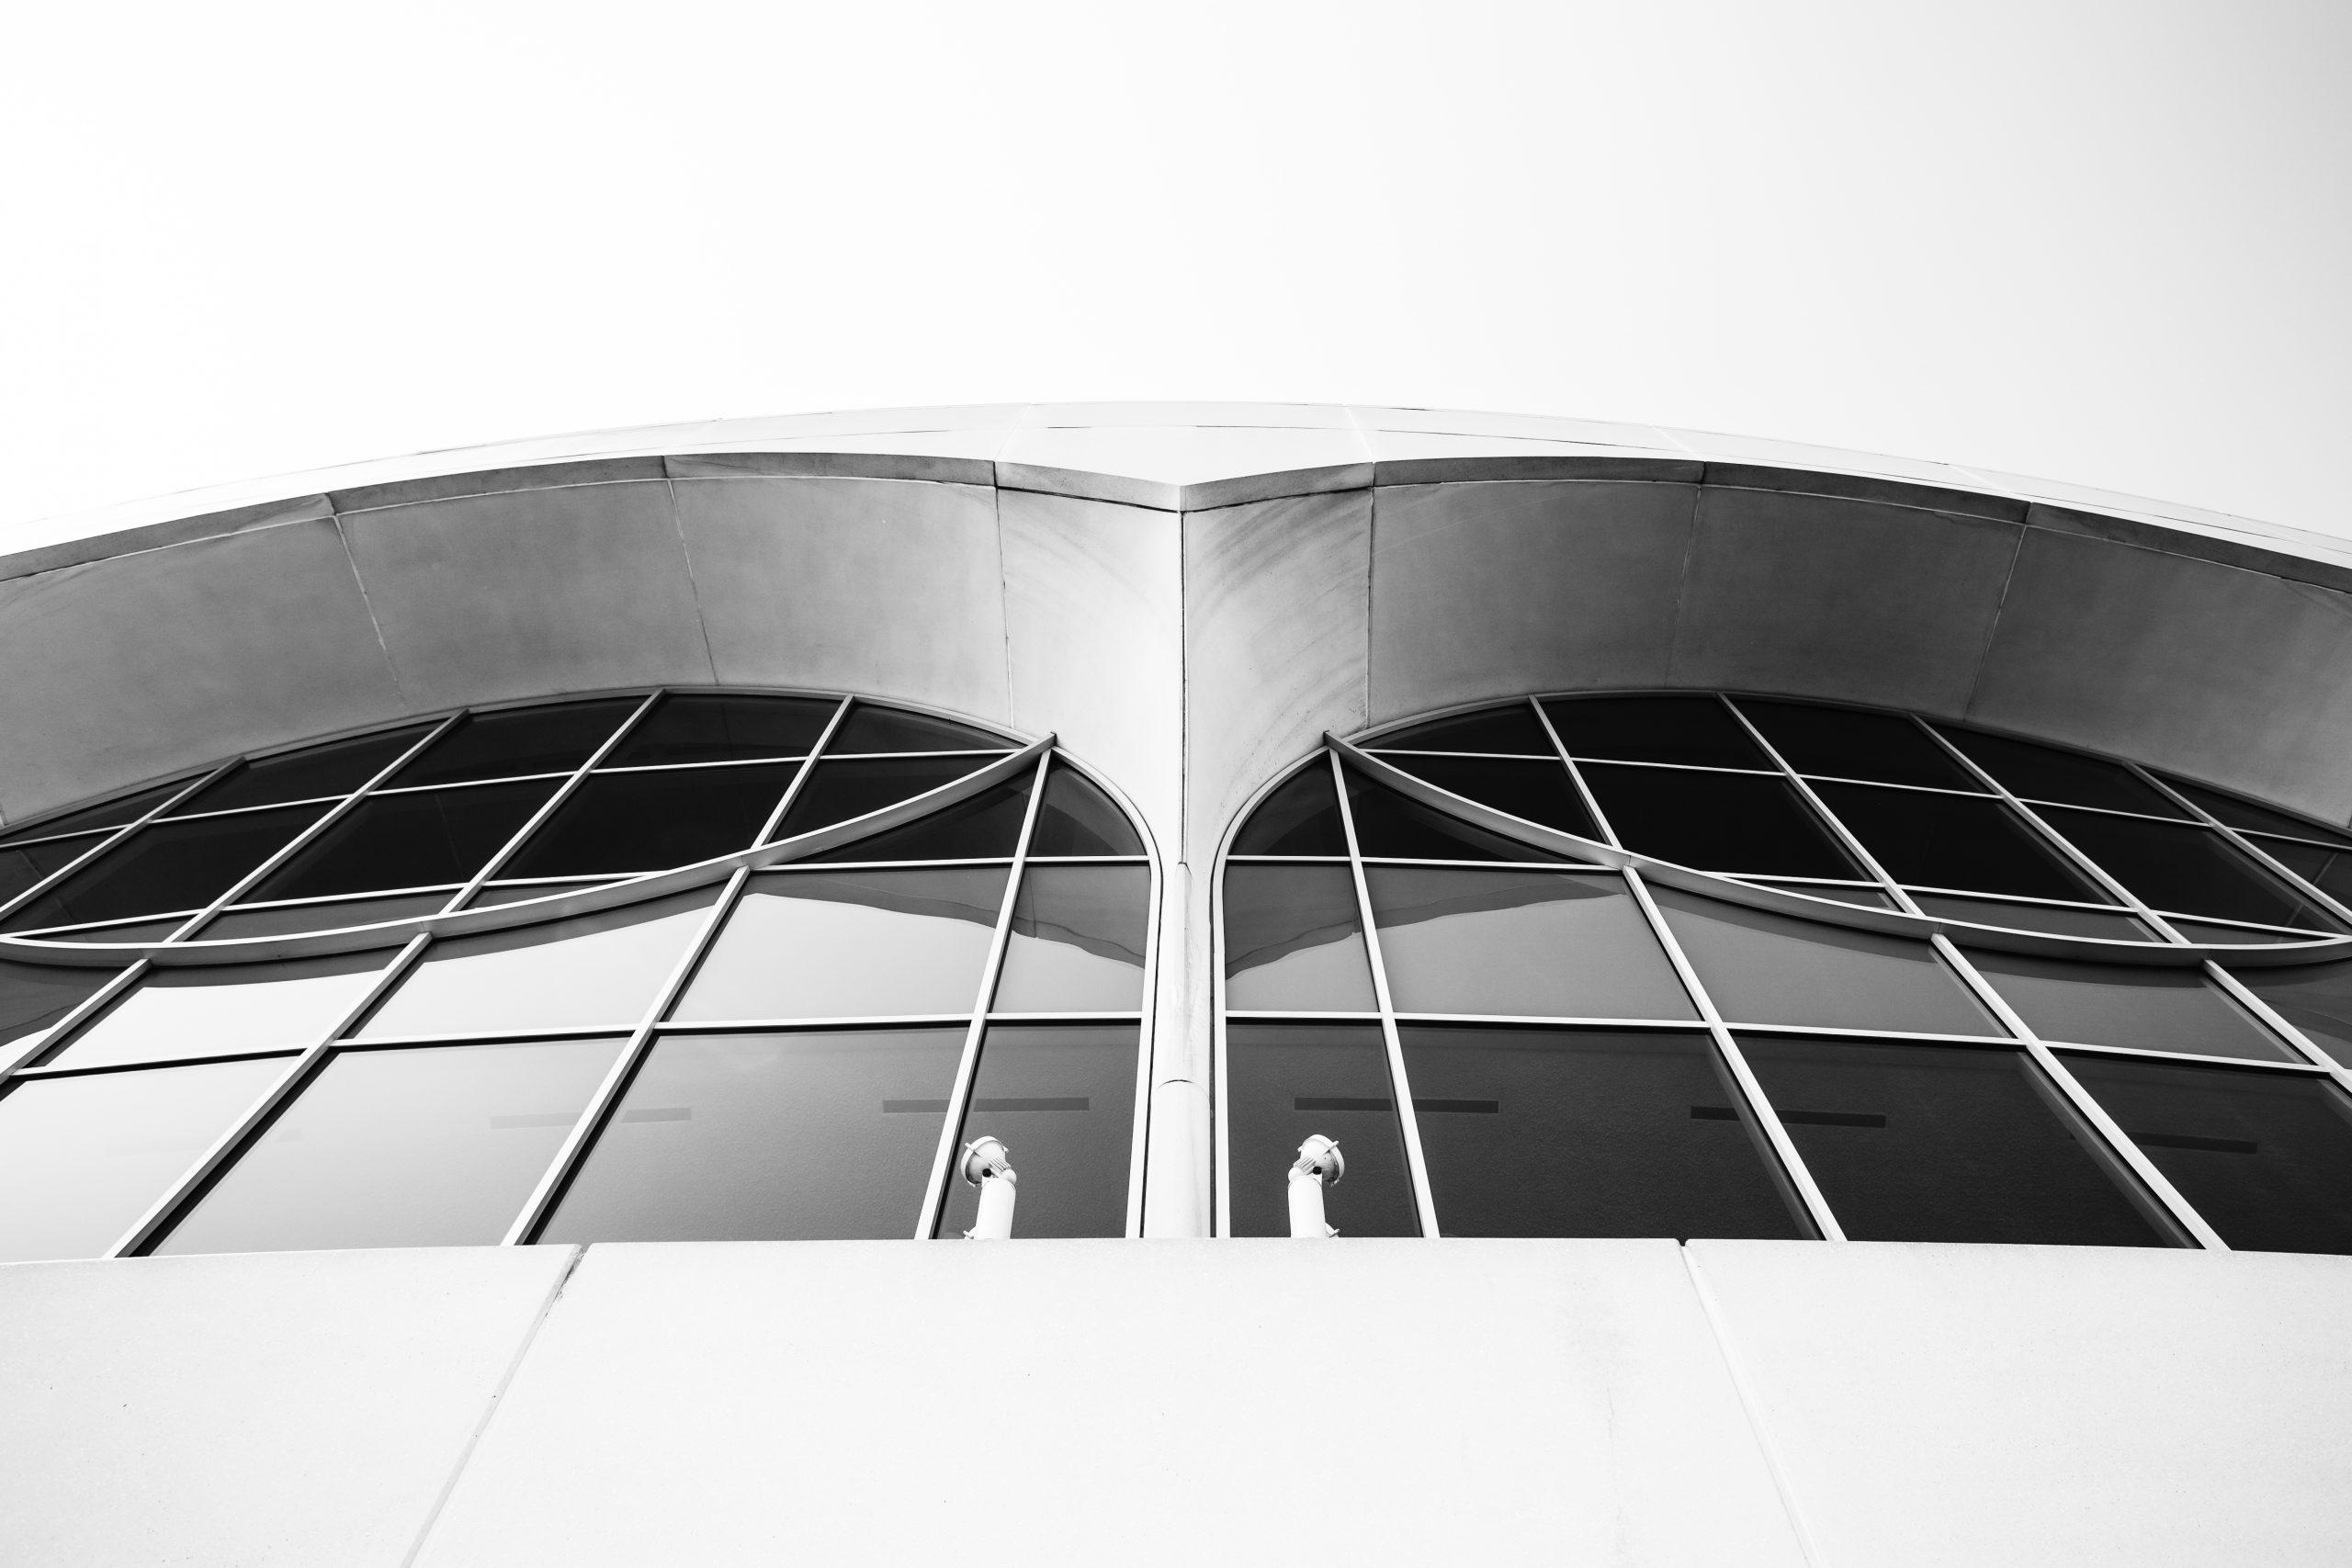 Frank Lloyd Wright in Wisconsin